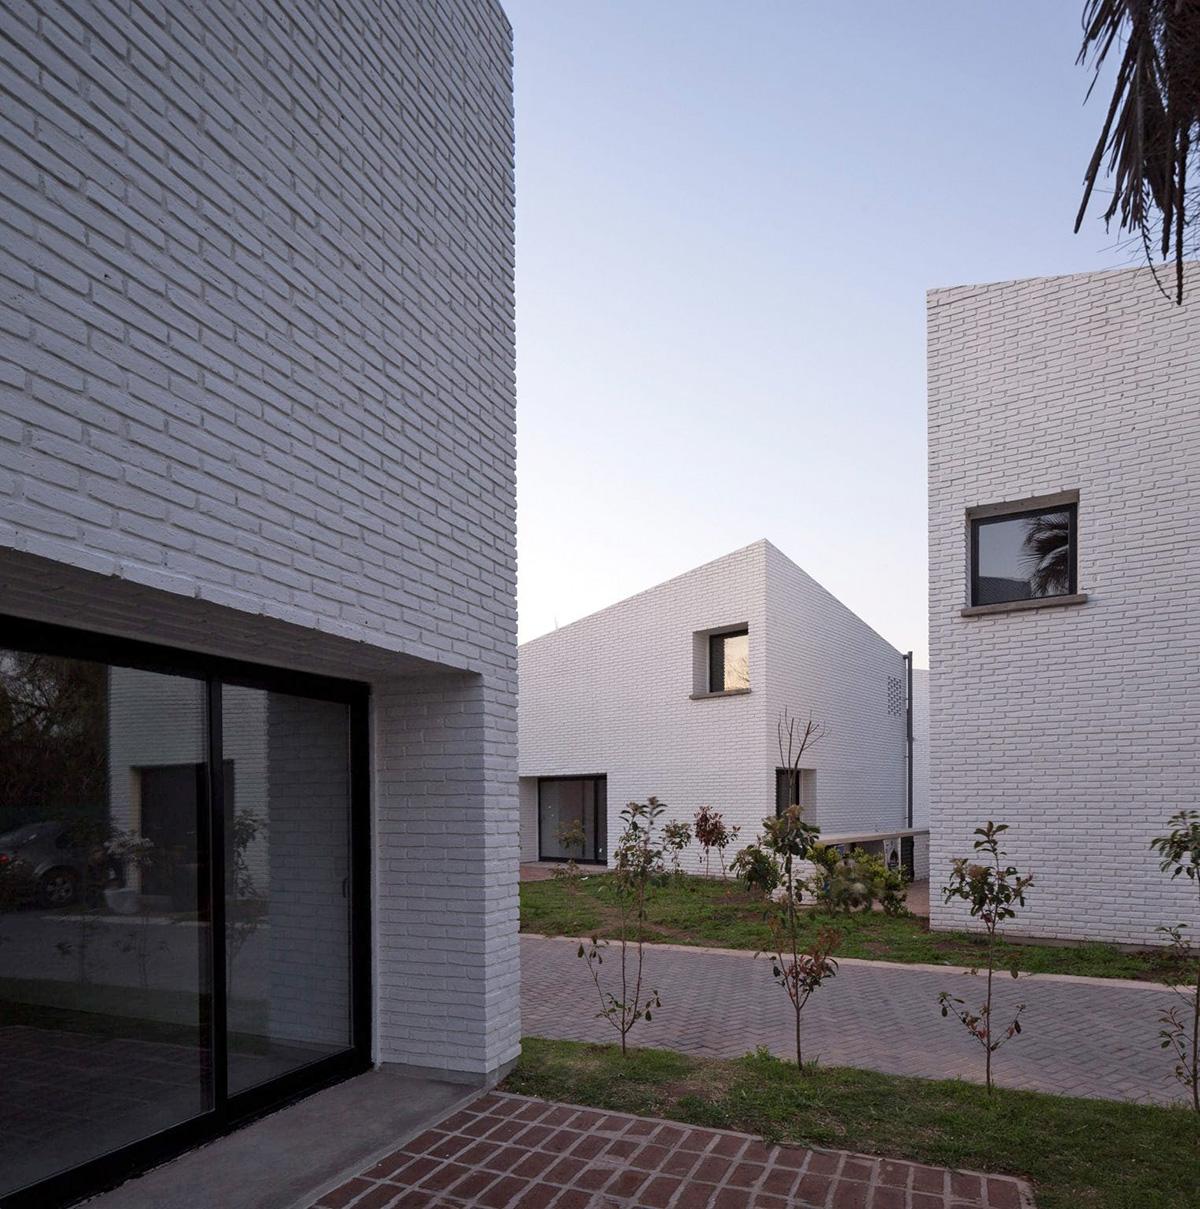 Complejo-Morrison-Balparda-Brunel-Oficina-Arquitectura-Javier-Agustin-Rojas-02